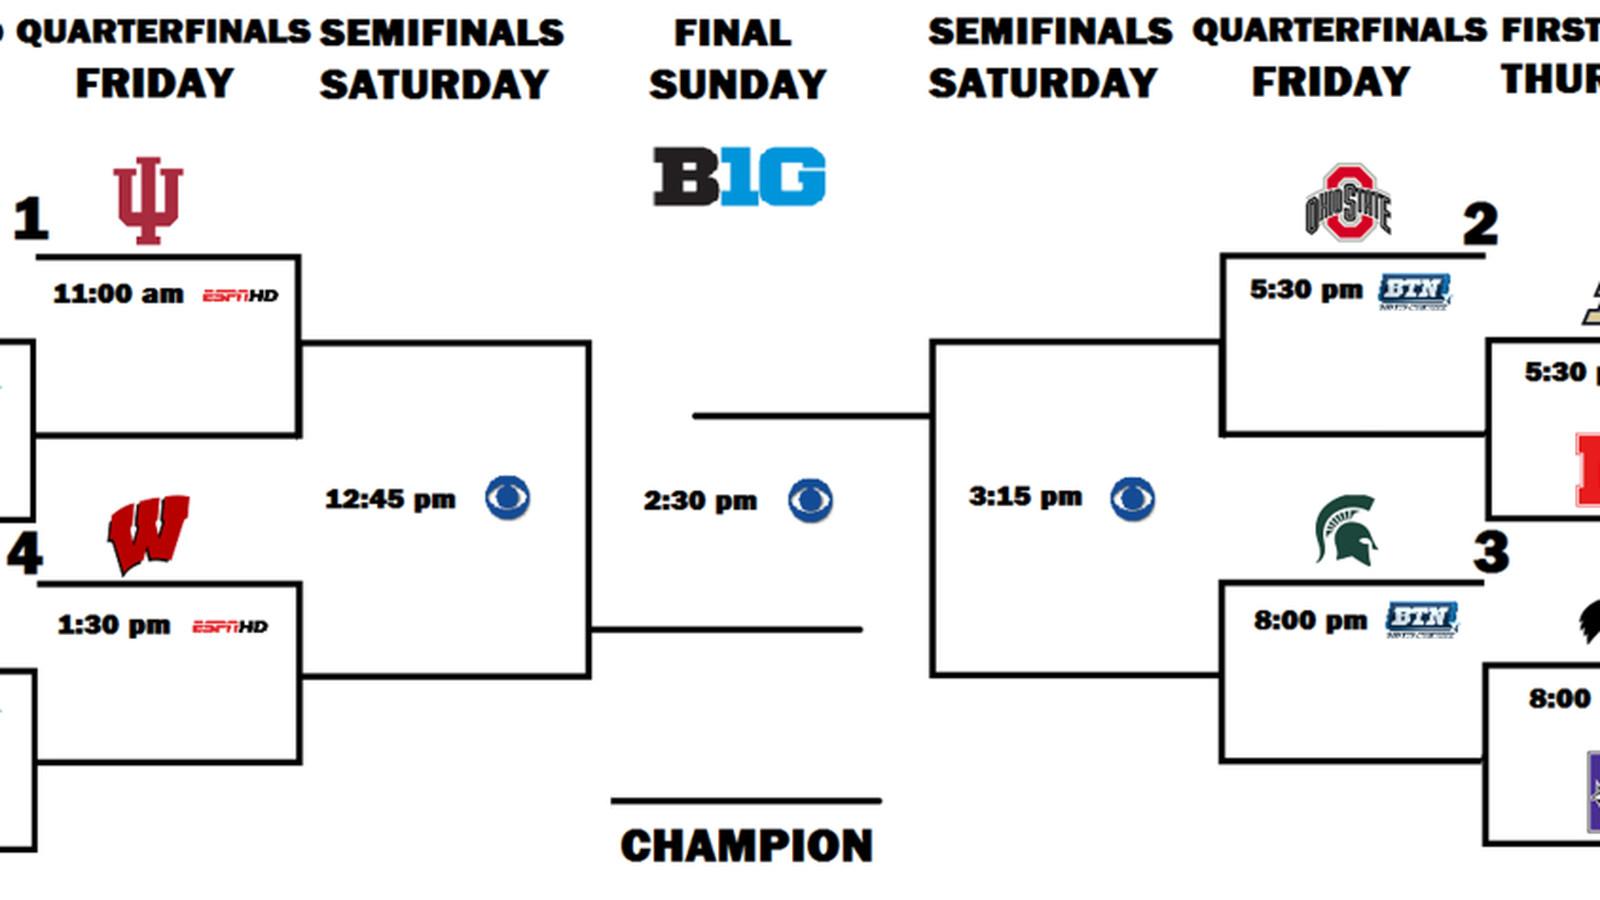 Satisfactory image with regard to big ten tournament printable bracket